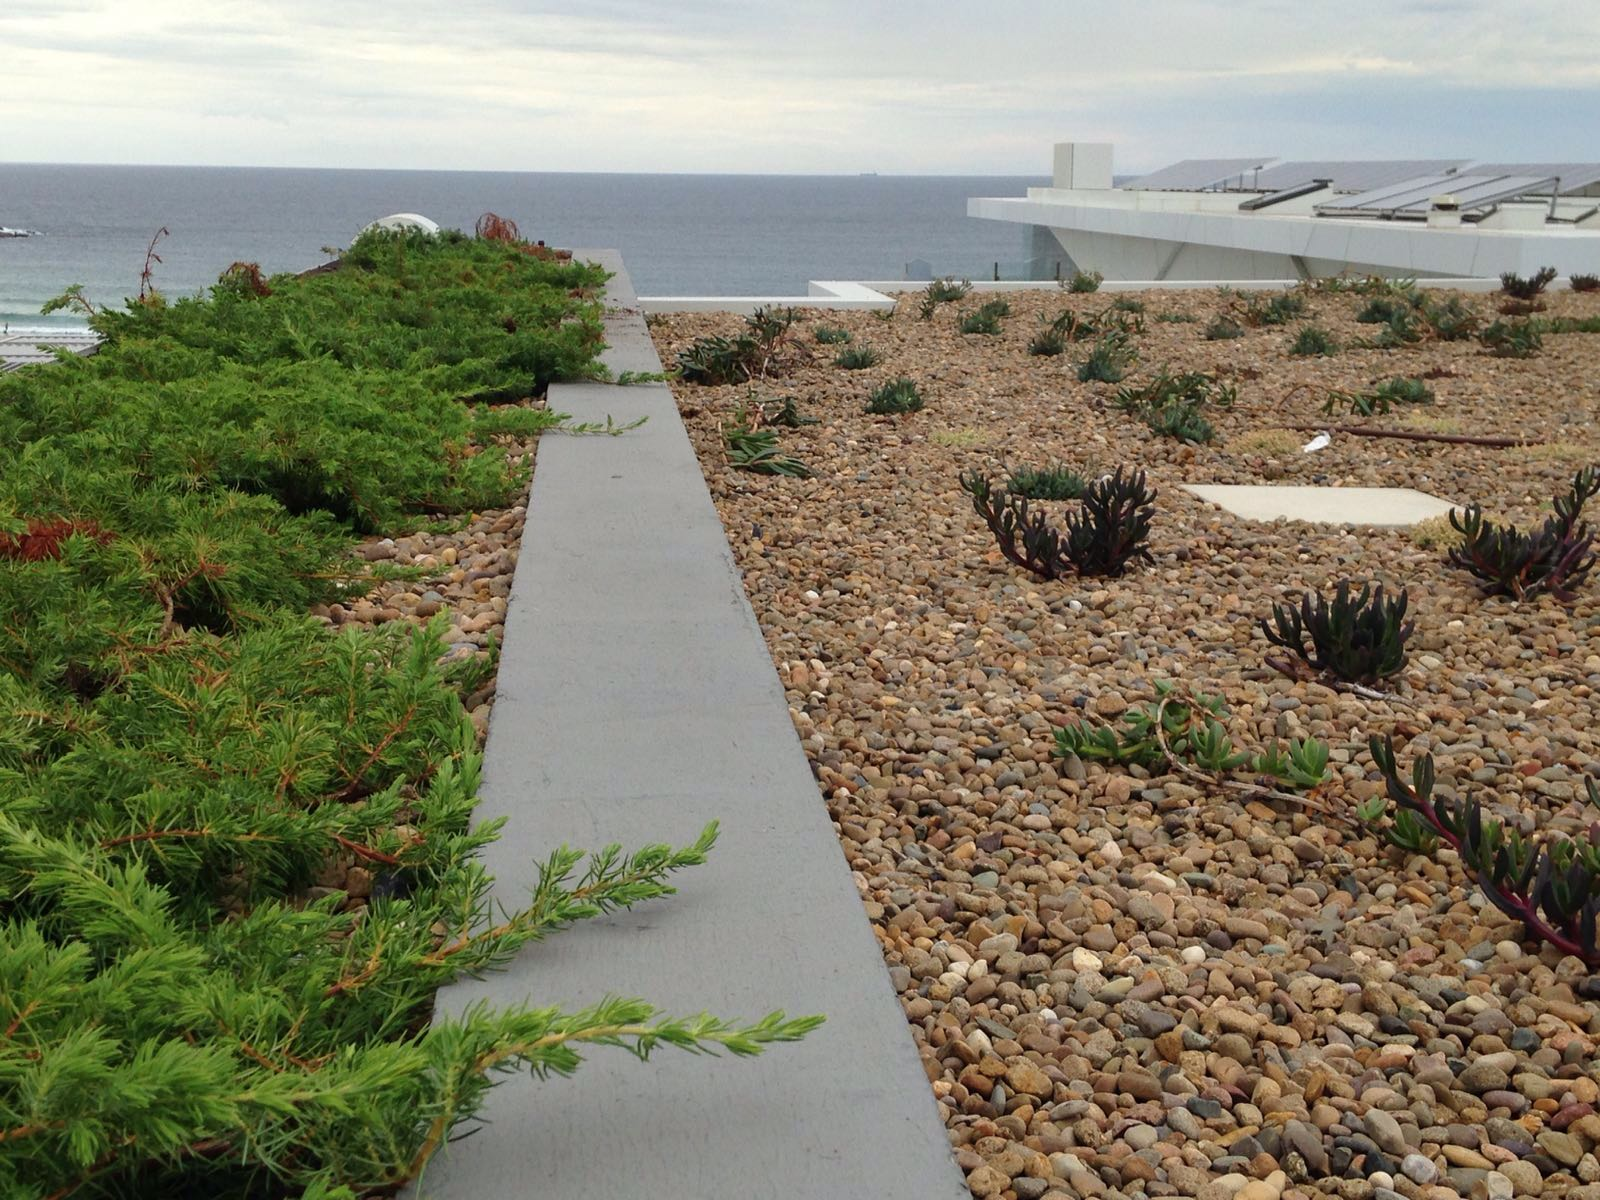 Green Roof Bondi Beach Sydney Australia